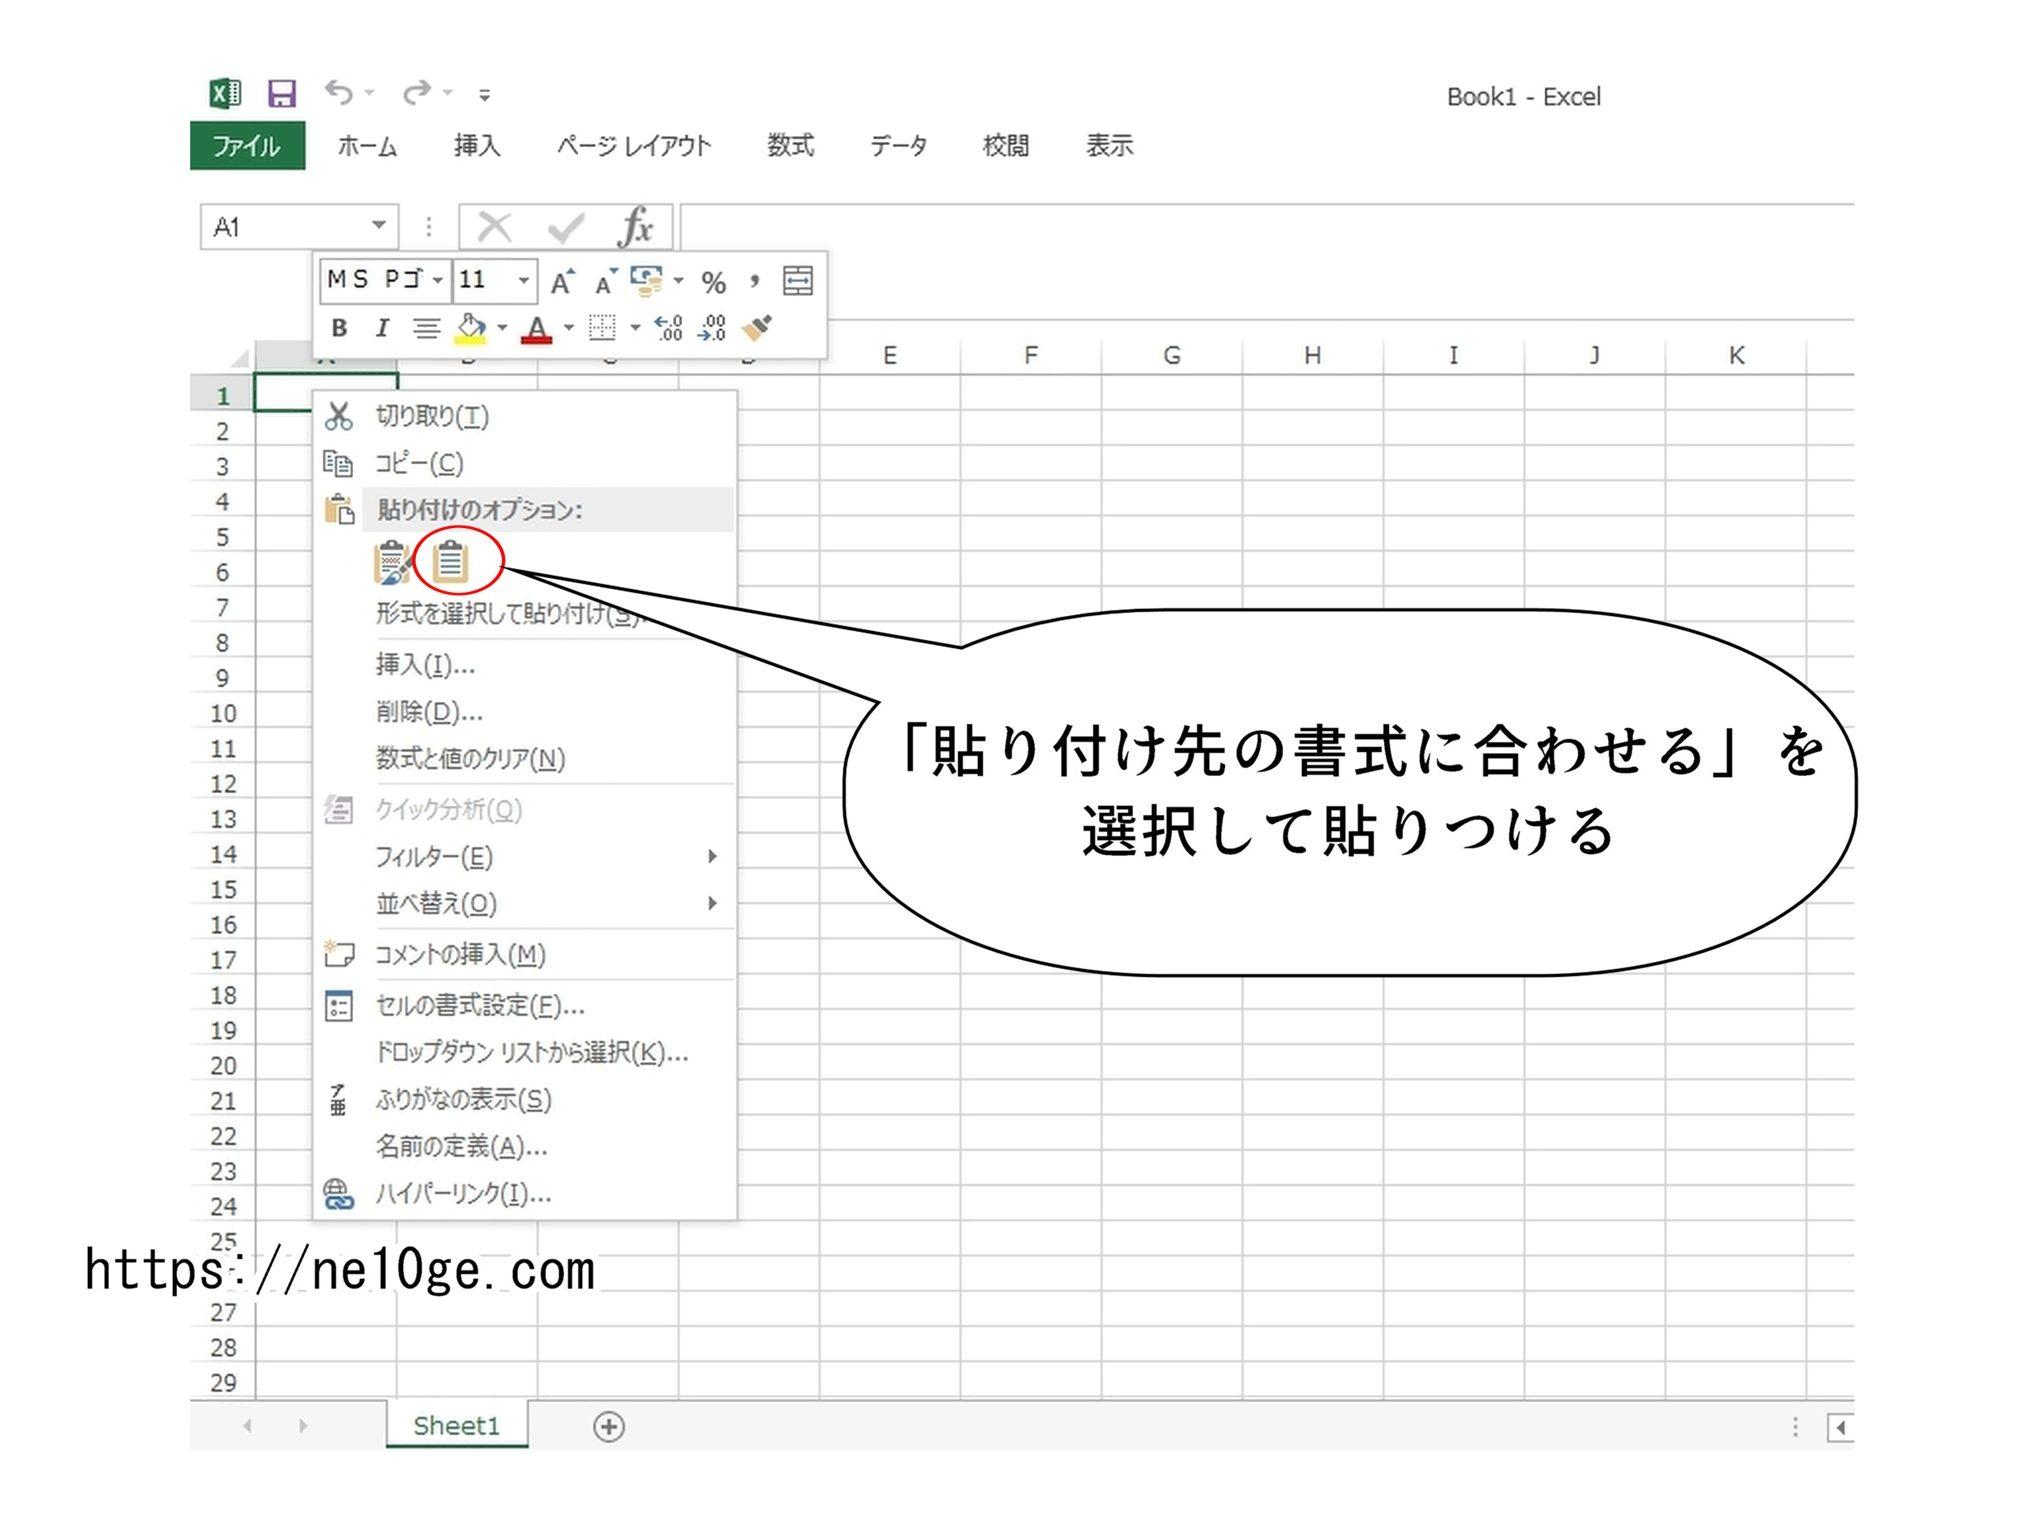 Excel エクセル 貼り付け方、「貼り付け先の書式に合わせる」を選択して貼りつける